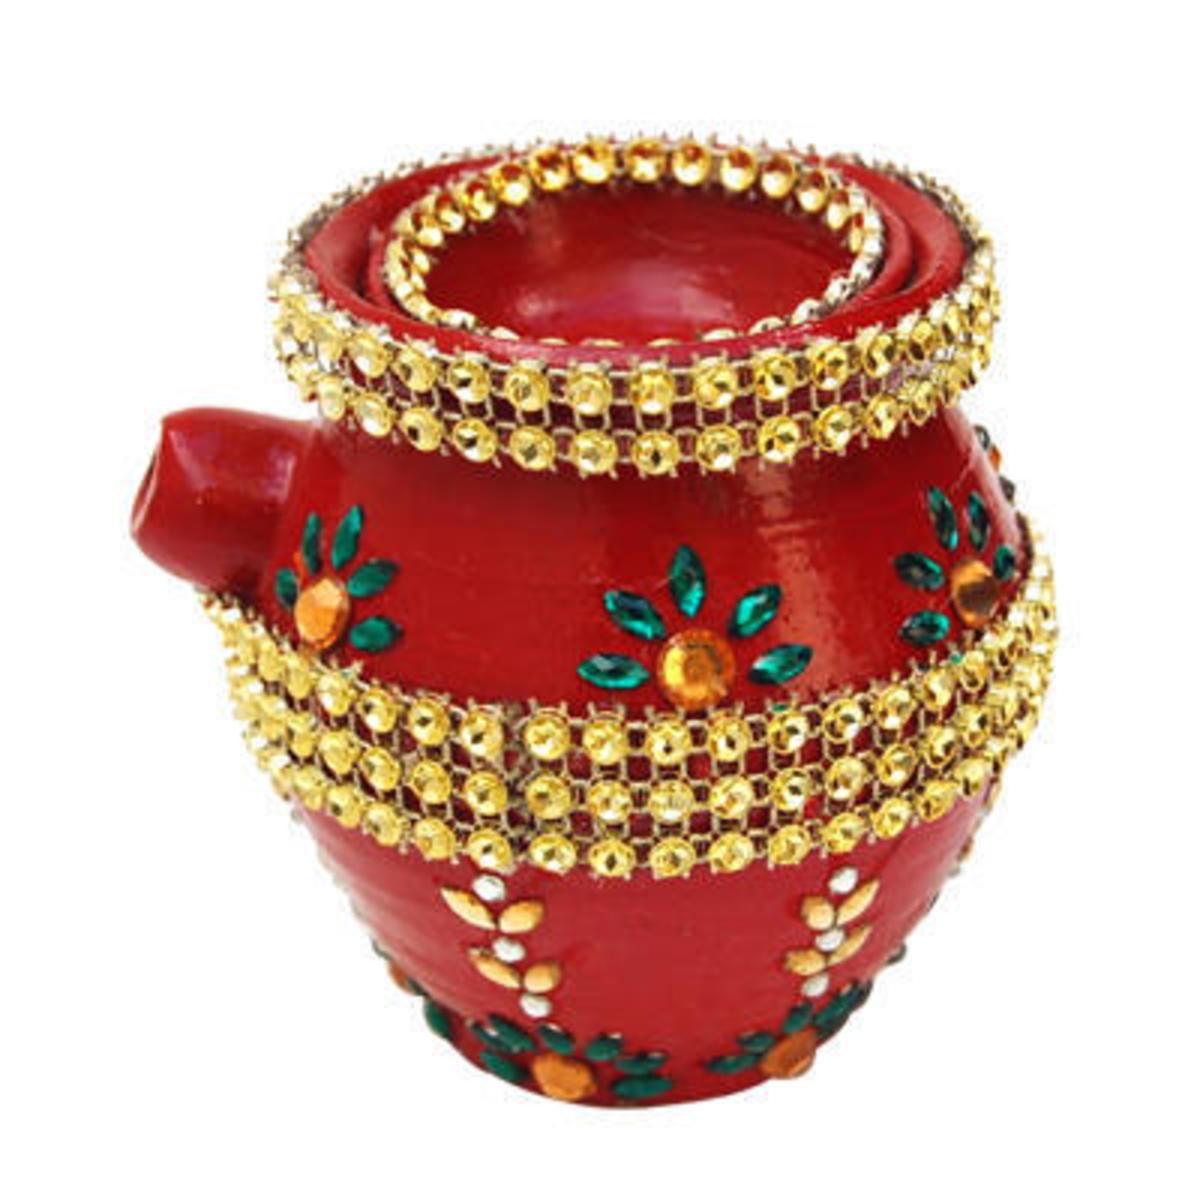 Example of a Kundan Karwa for Karwa Chauth Source:Indian Gift Portal